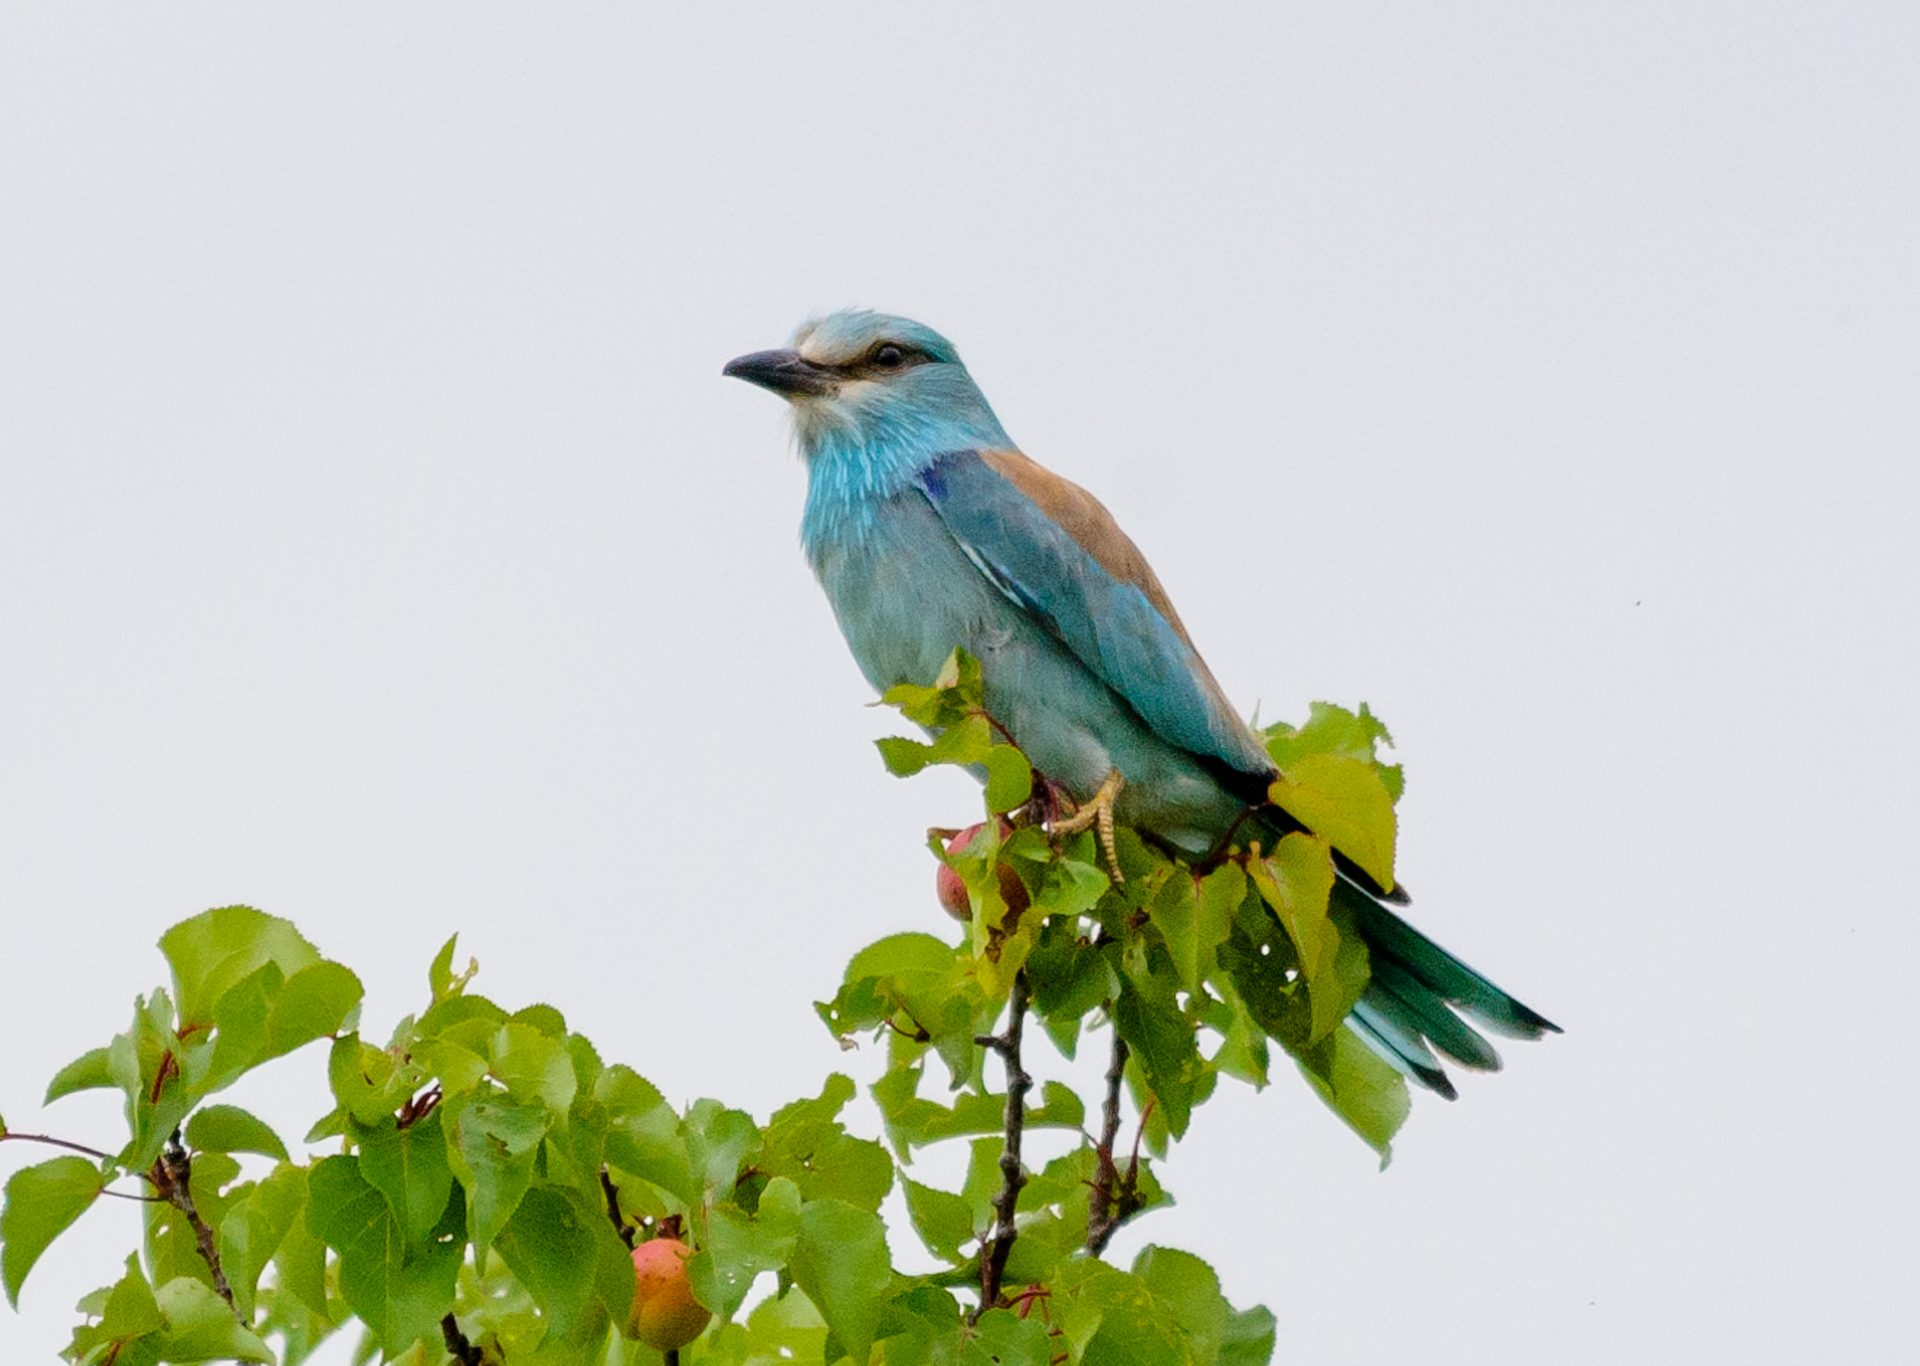 Sininärhi - Blåkråka